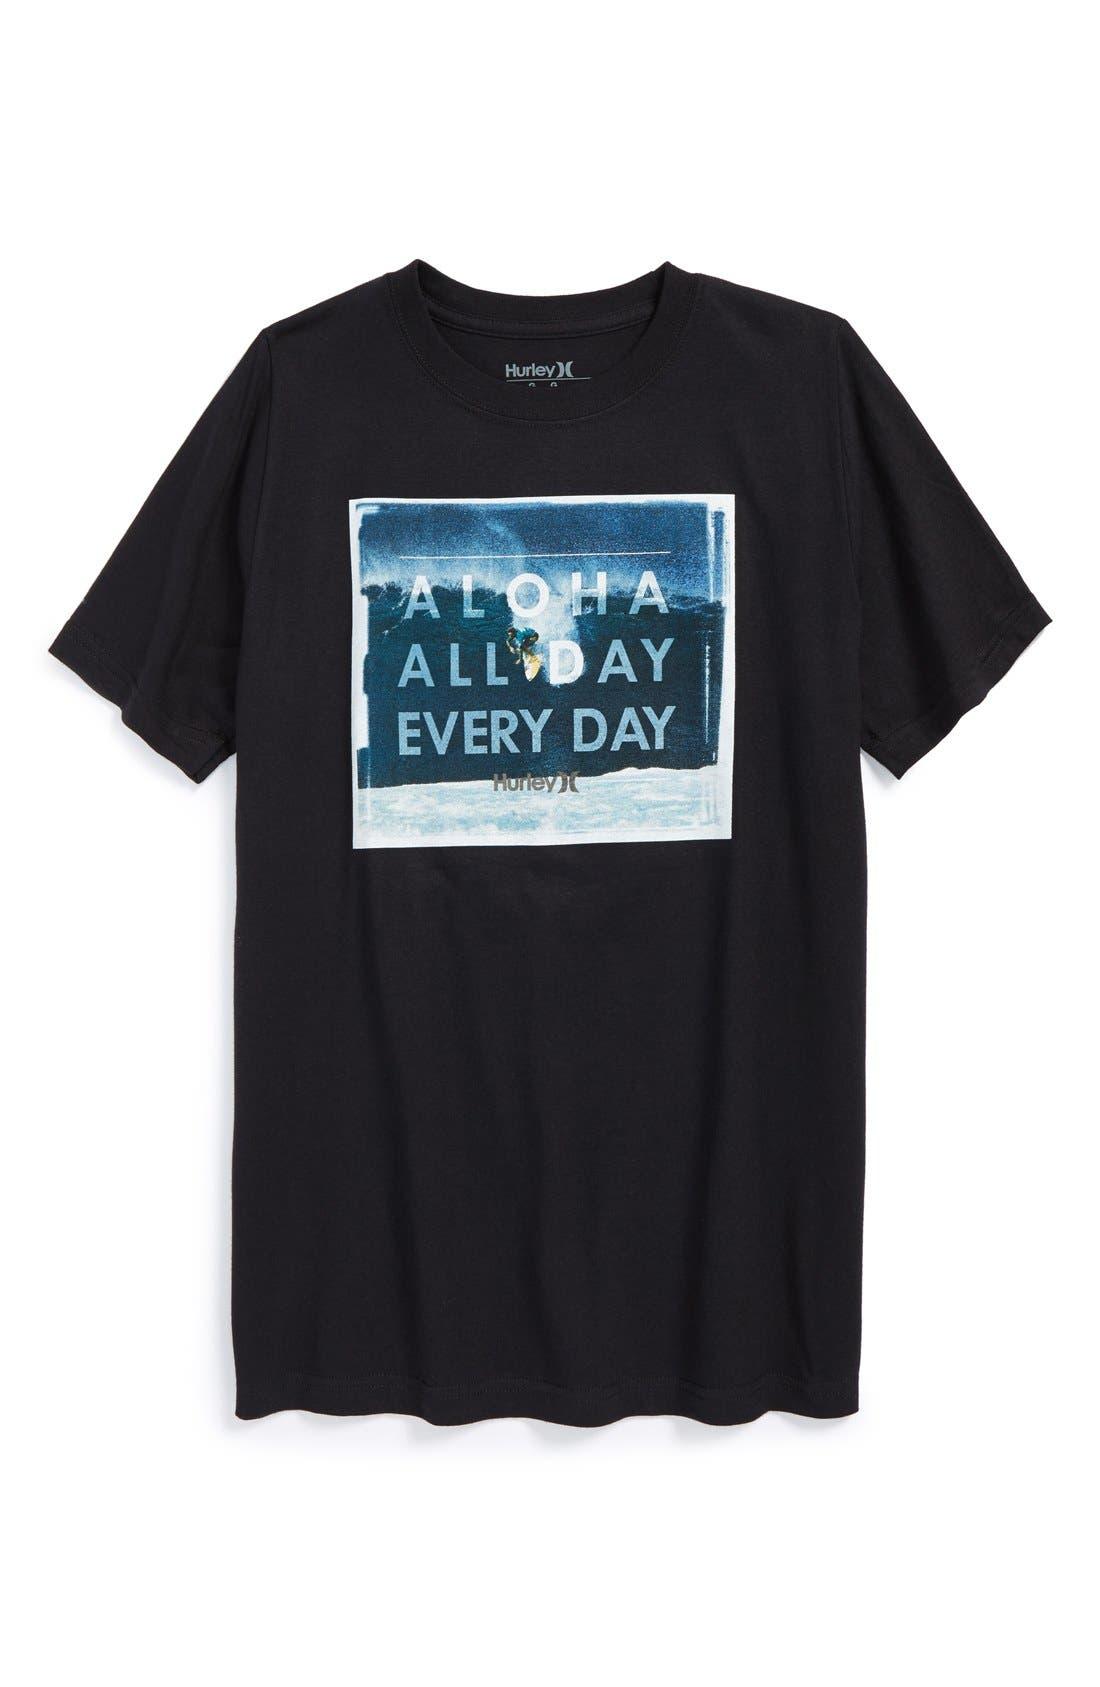 HURLEY,                             'Aloha All Day Every Day' Screenprint T-Shirt,                             Main thumbnail 1, color,                             001